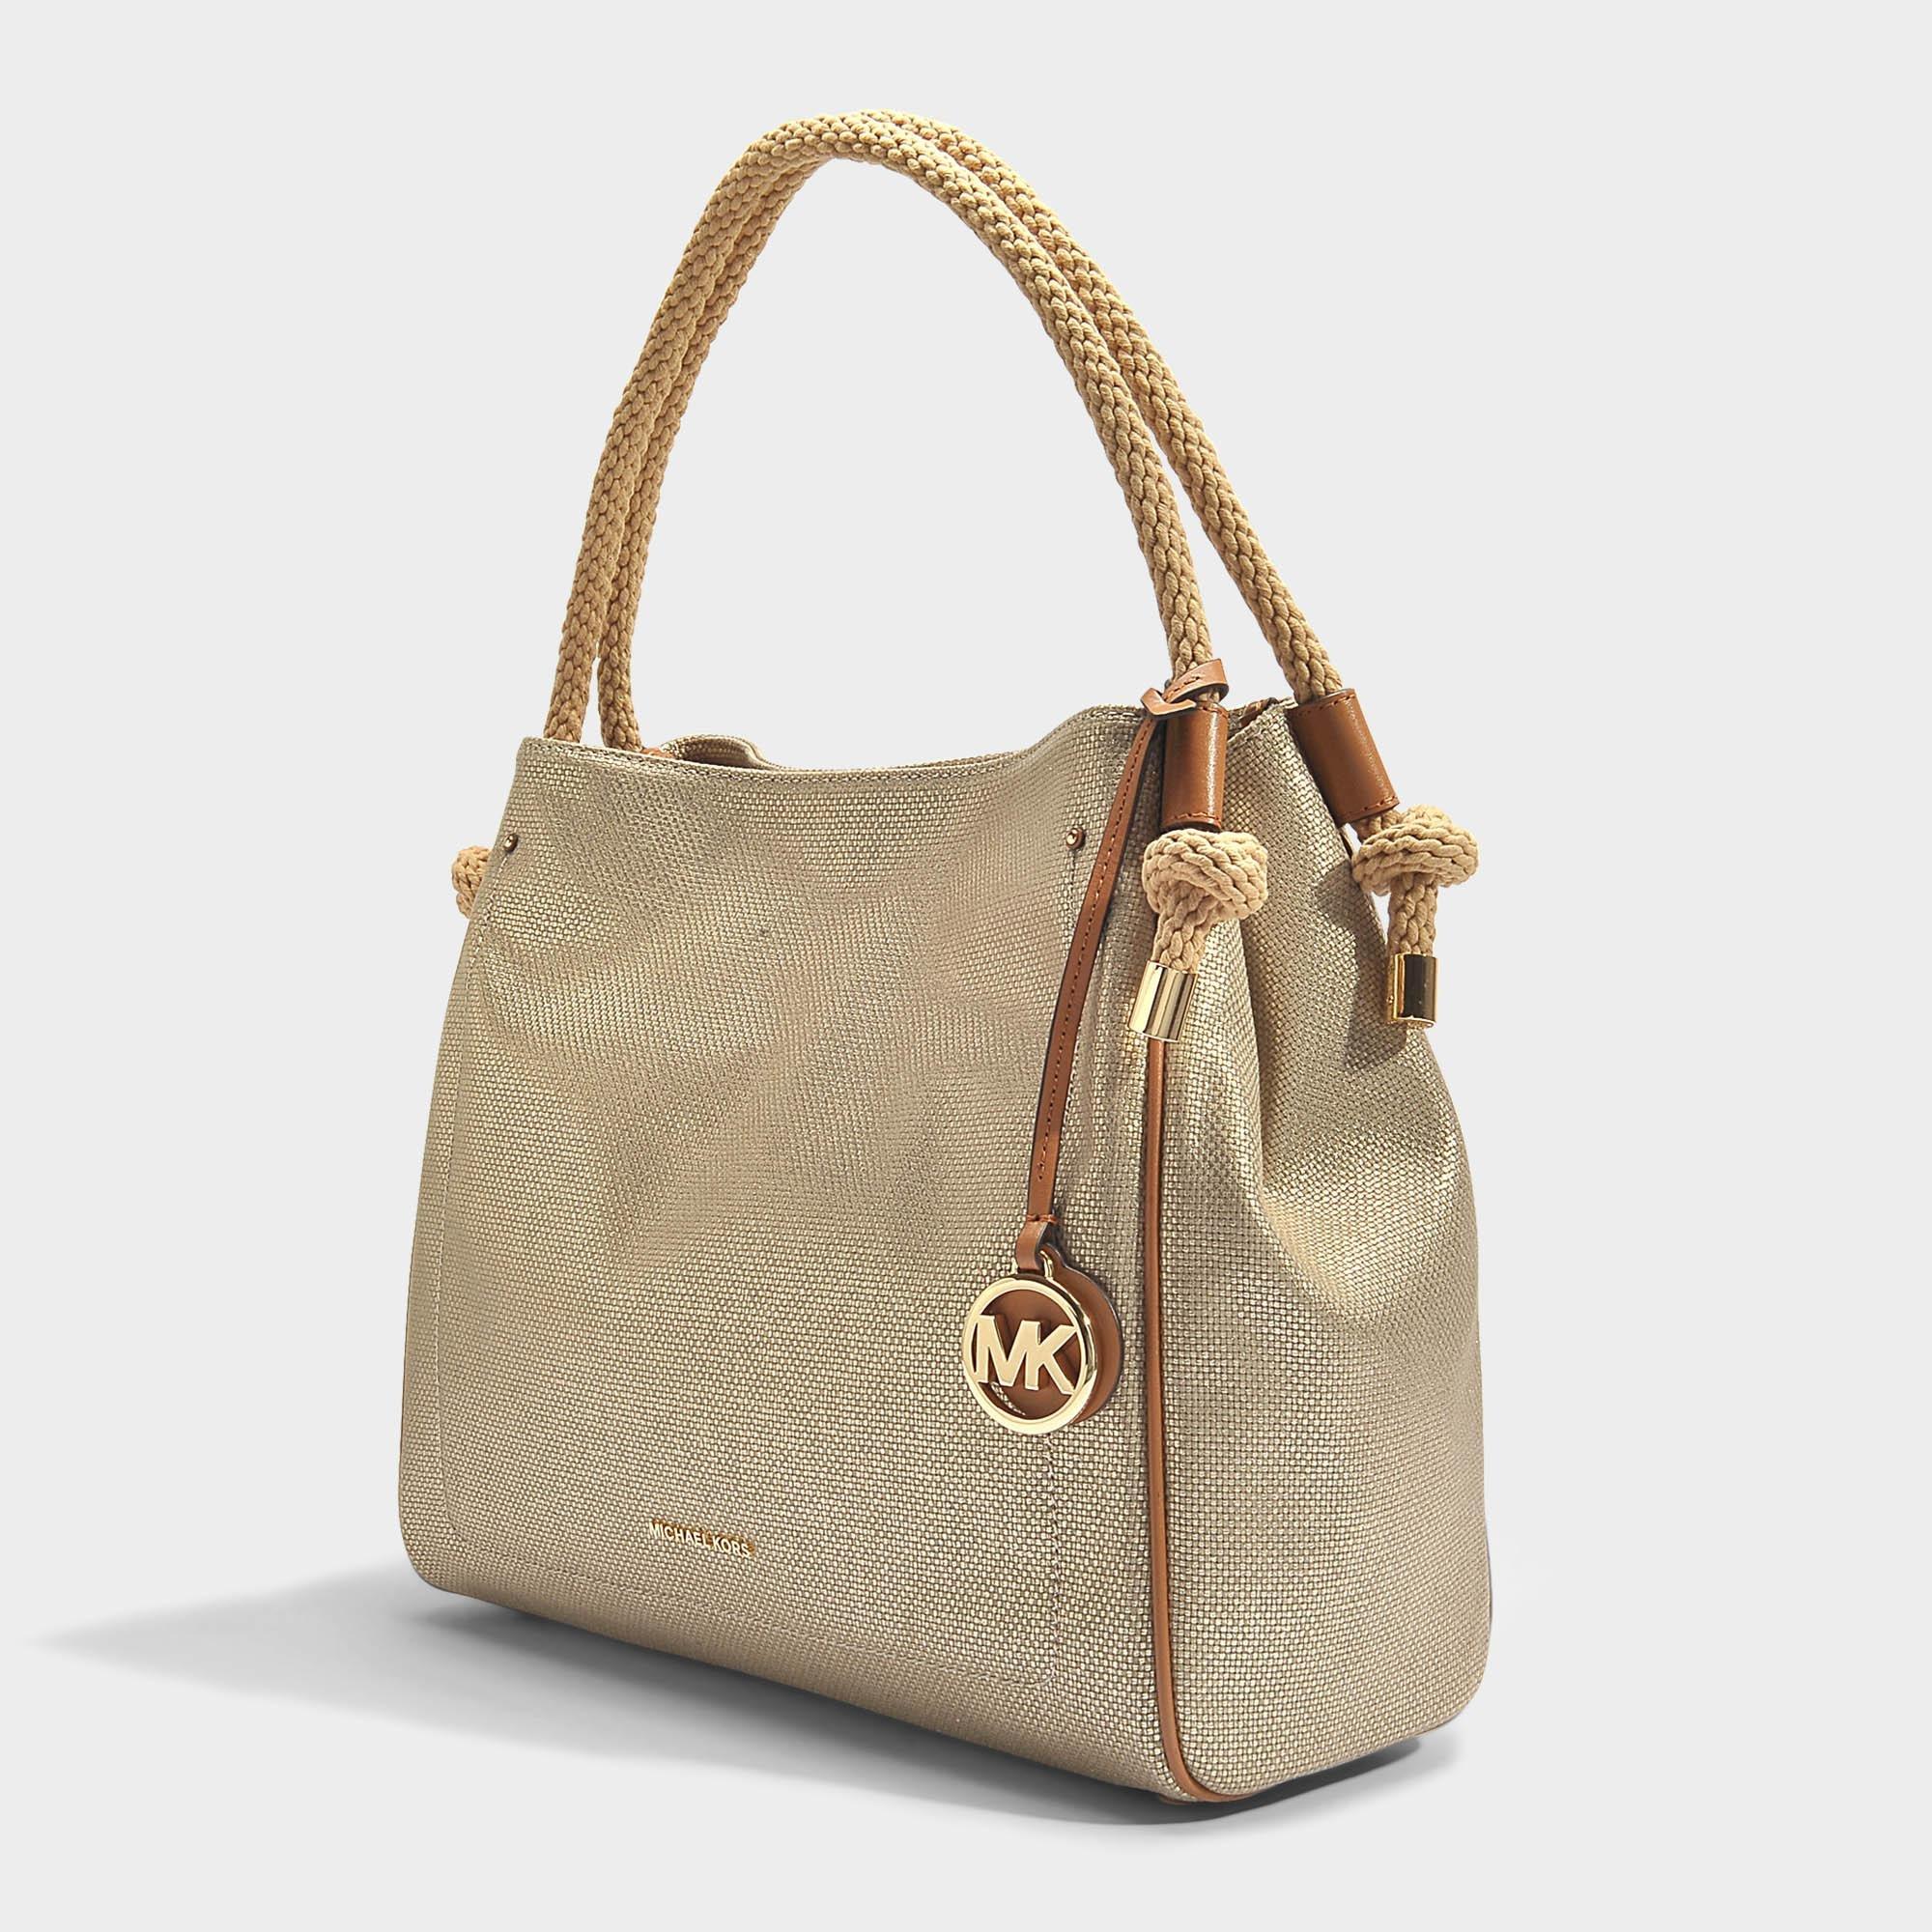 9f547ba57aab MICHAEL Michael Kors Isla Large Grab Bag In Pale Gold Metallic ...